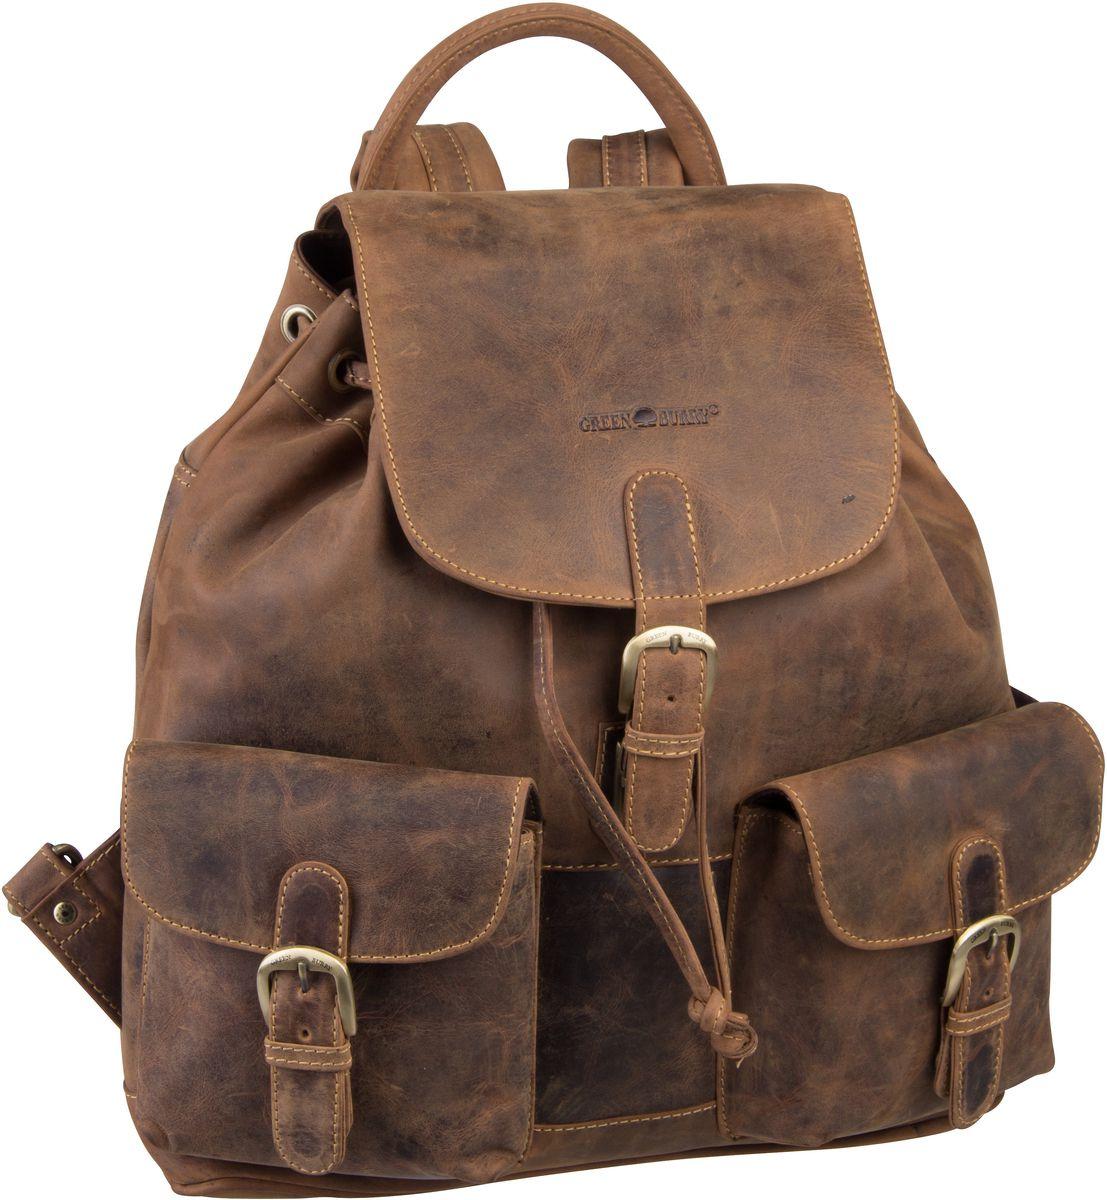 Rucksack / Daypack Vintage 1711 Rucksack Sattelbraun